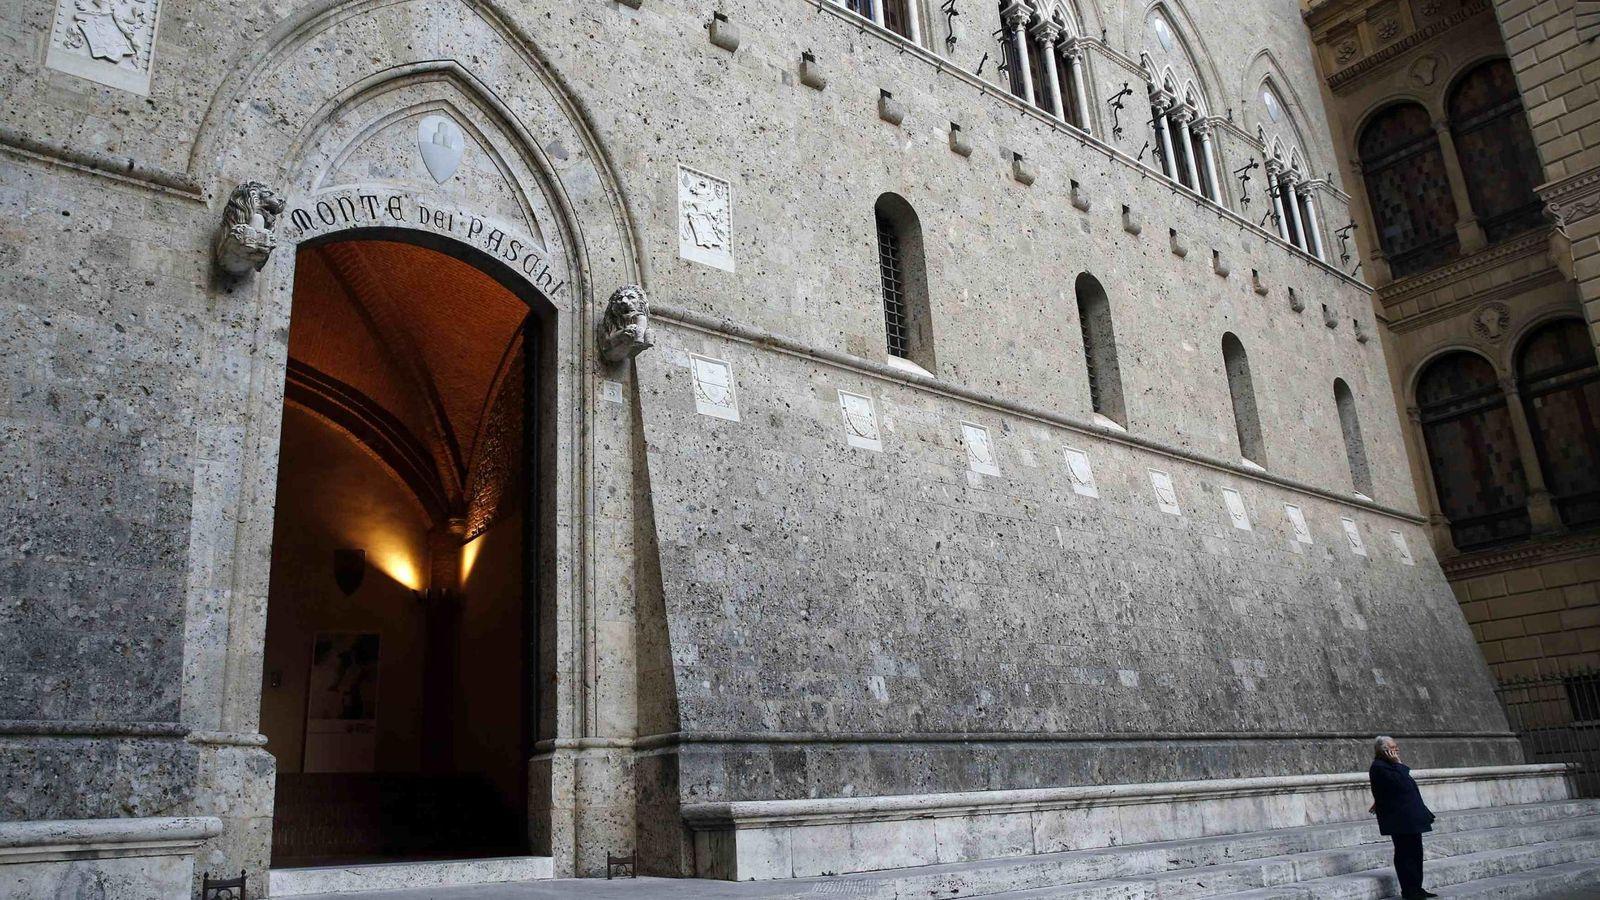 Foto: La sede central de Monte dei Paschi di Siena. (Reuters)